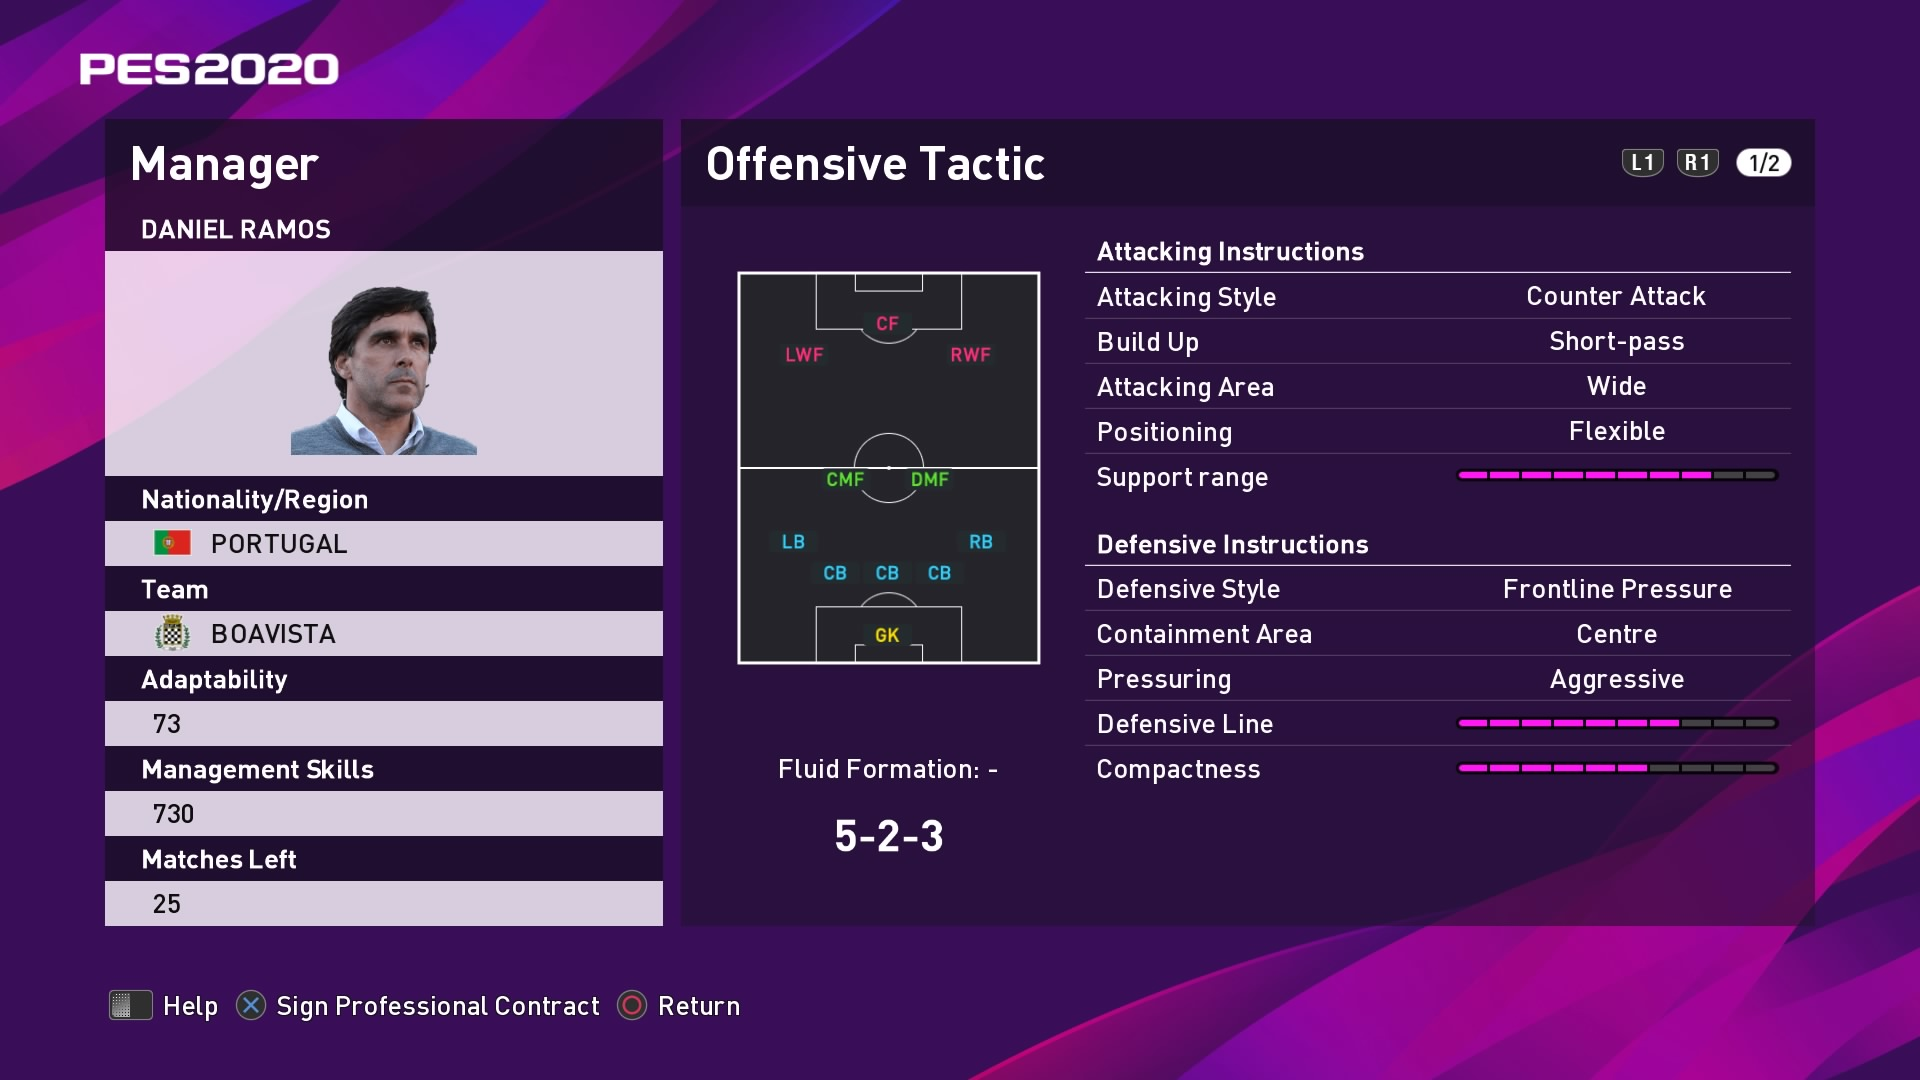 Daniel Ramos Offensive Tactic in PES 2020 myClub